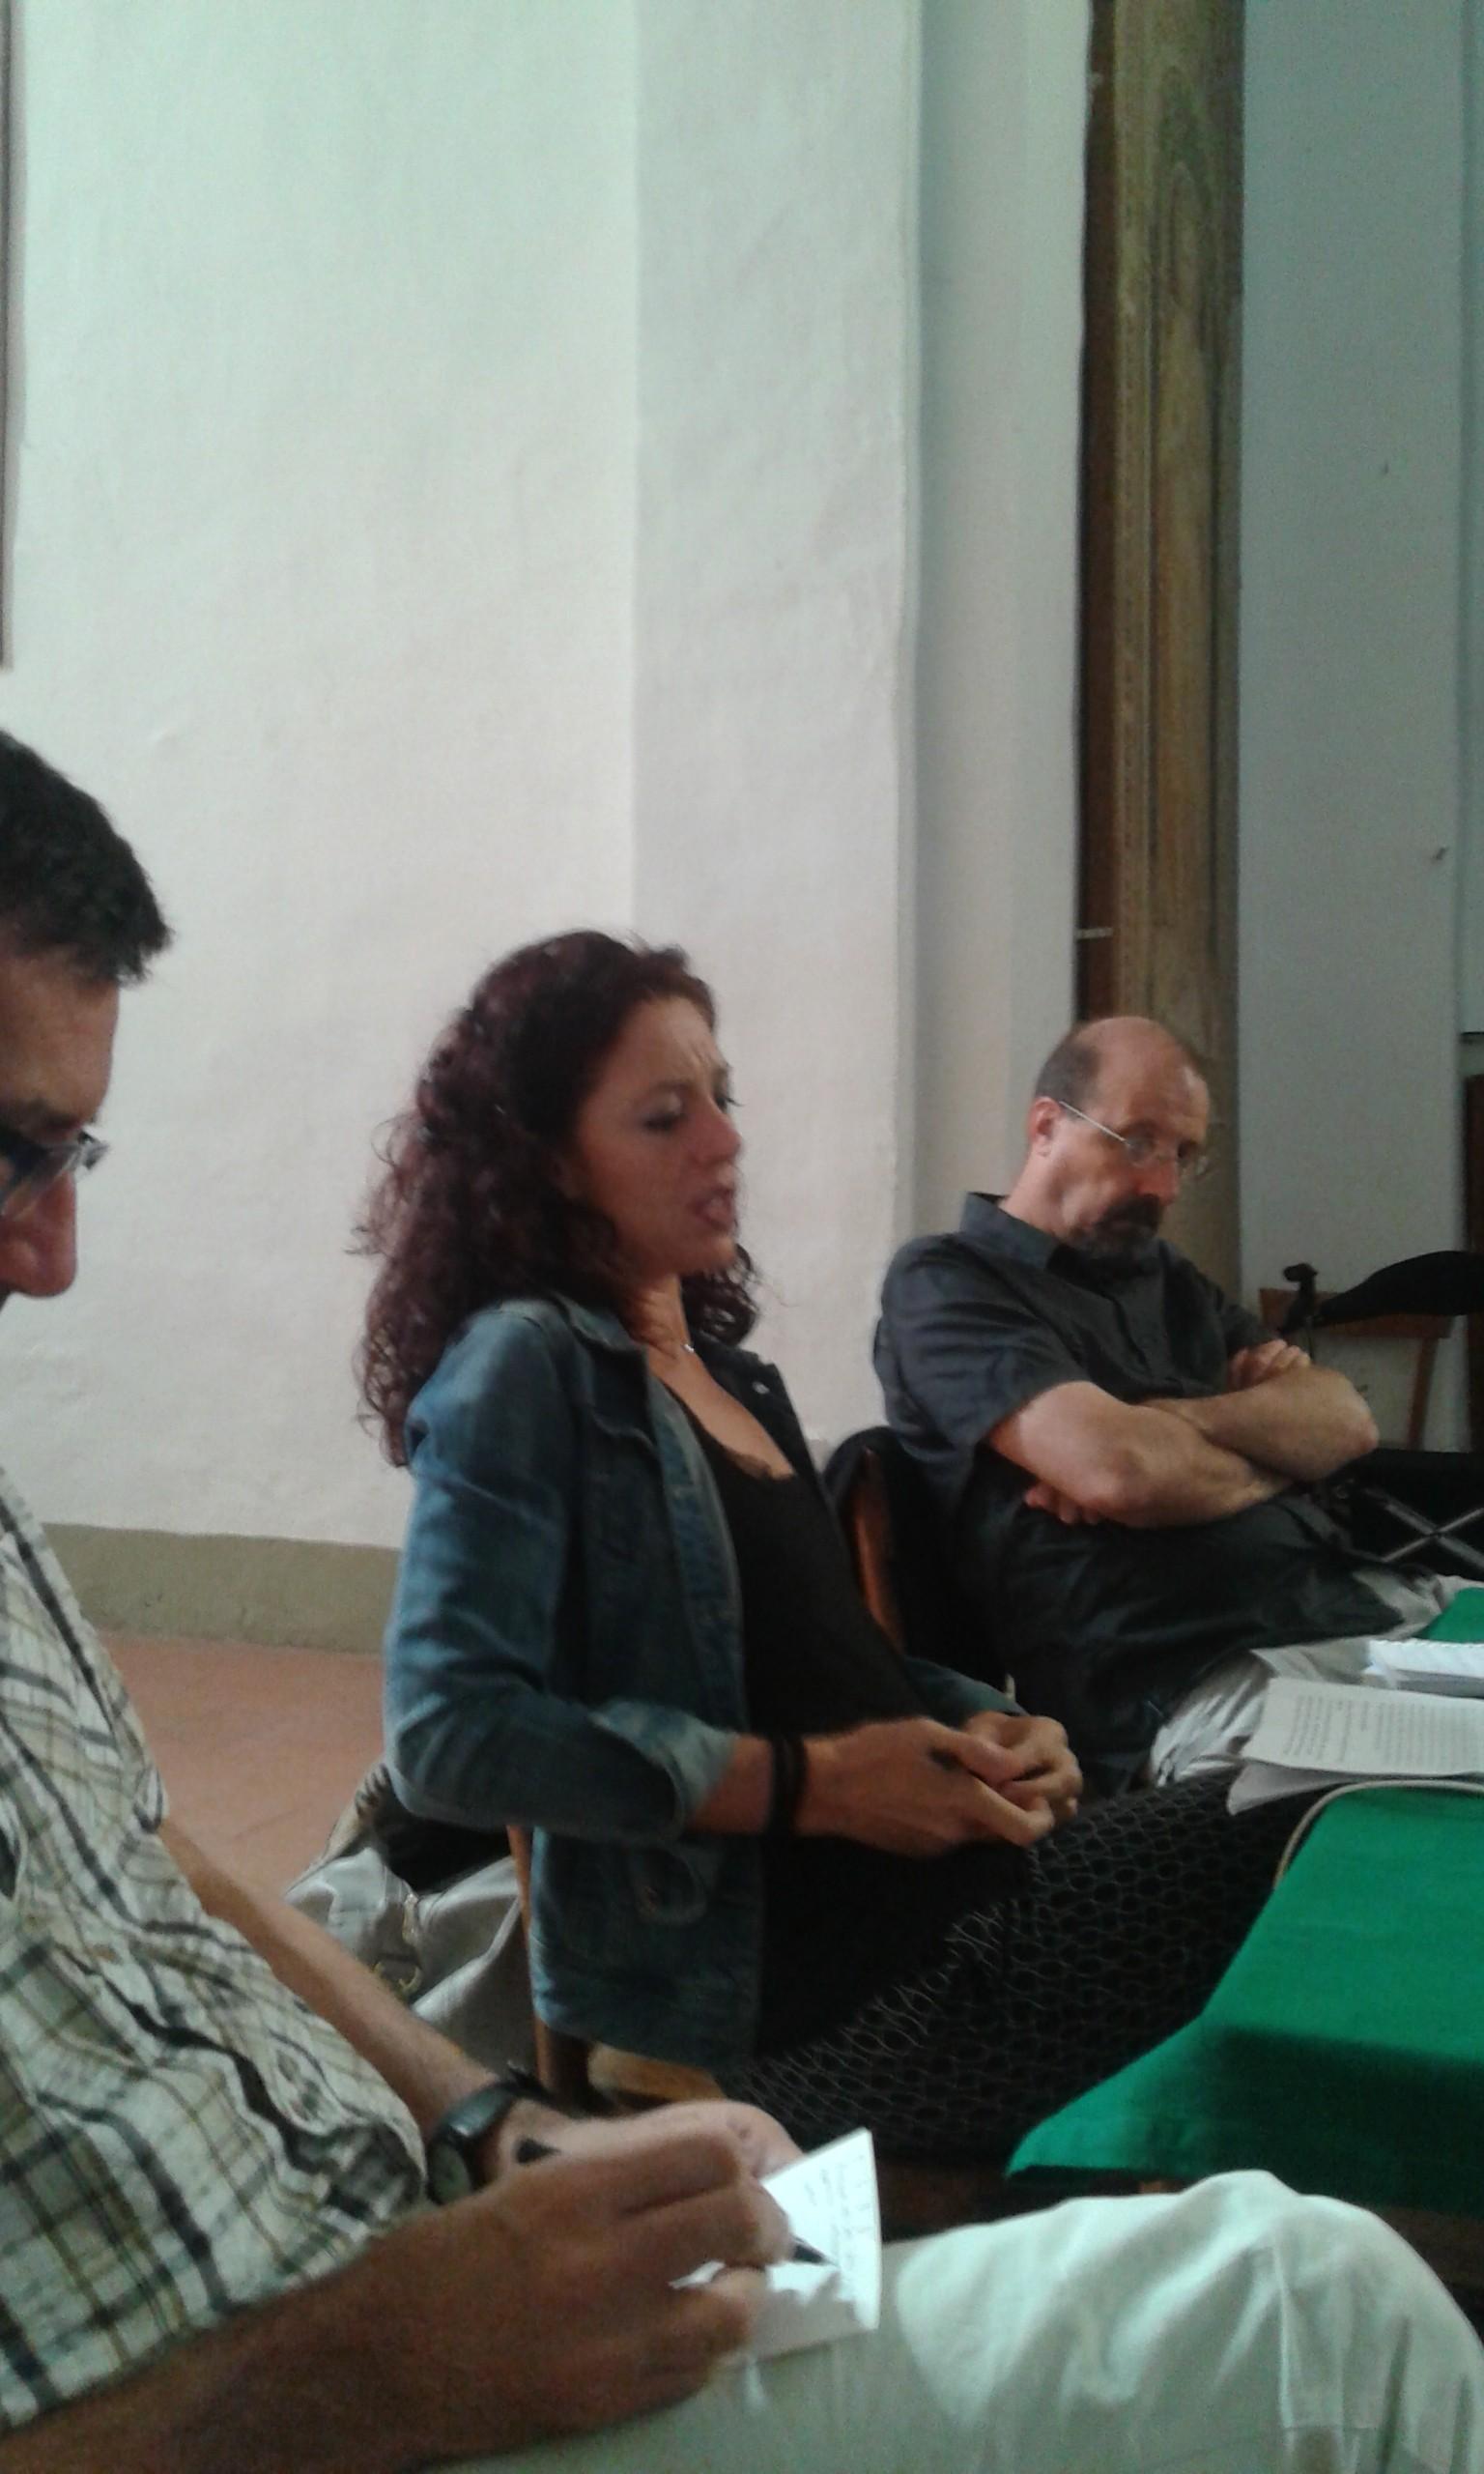 A. Cortesi (Espaces), F. Paci (La Stampa), D. D'Andrea (Unifi)